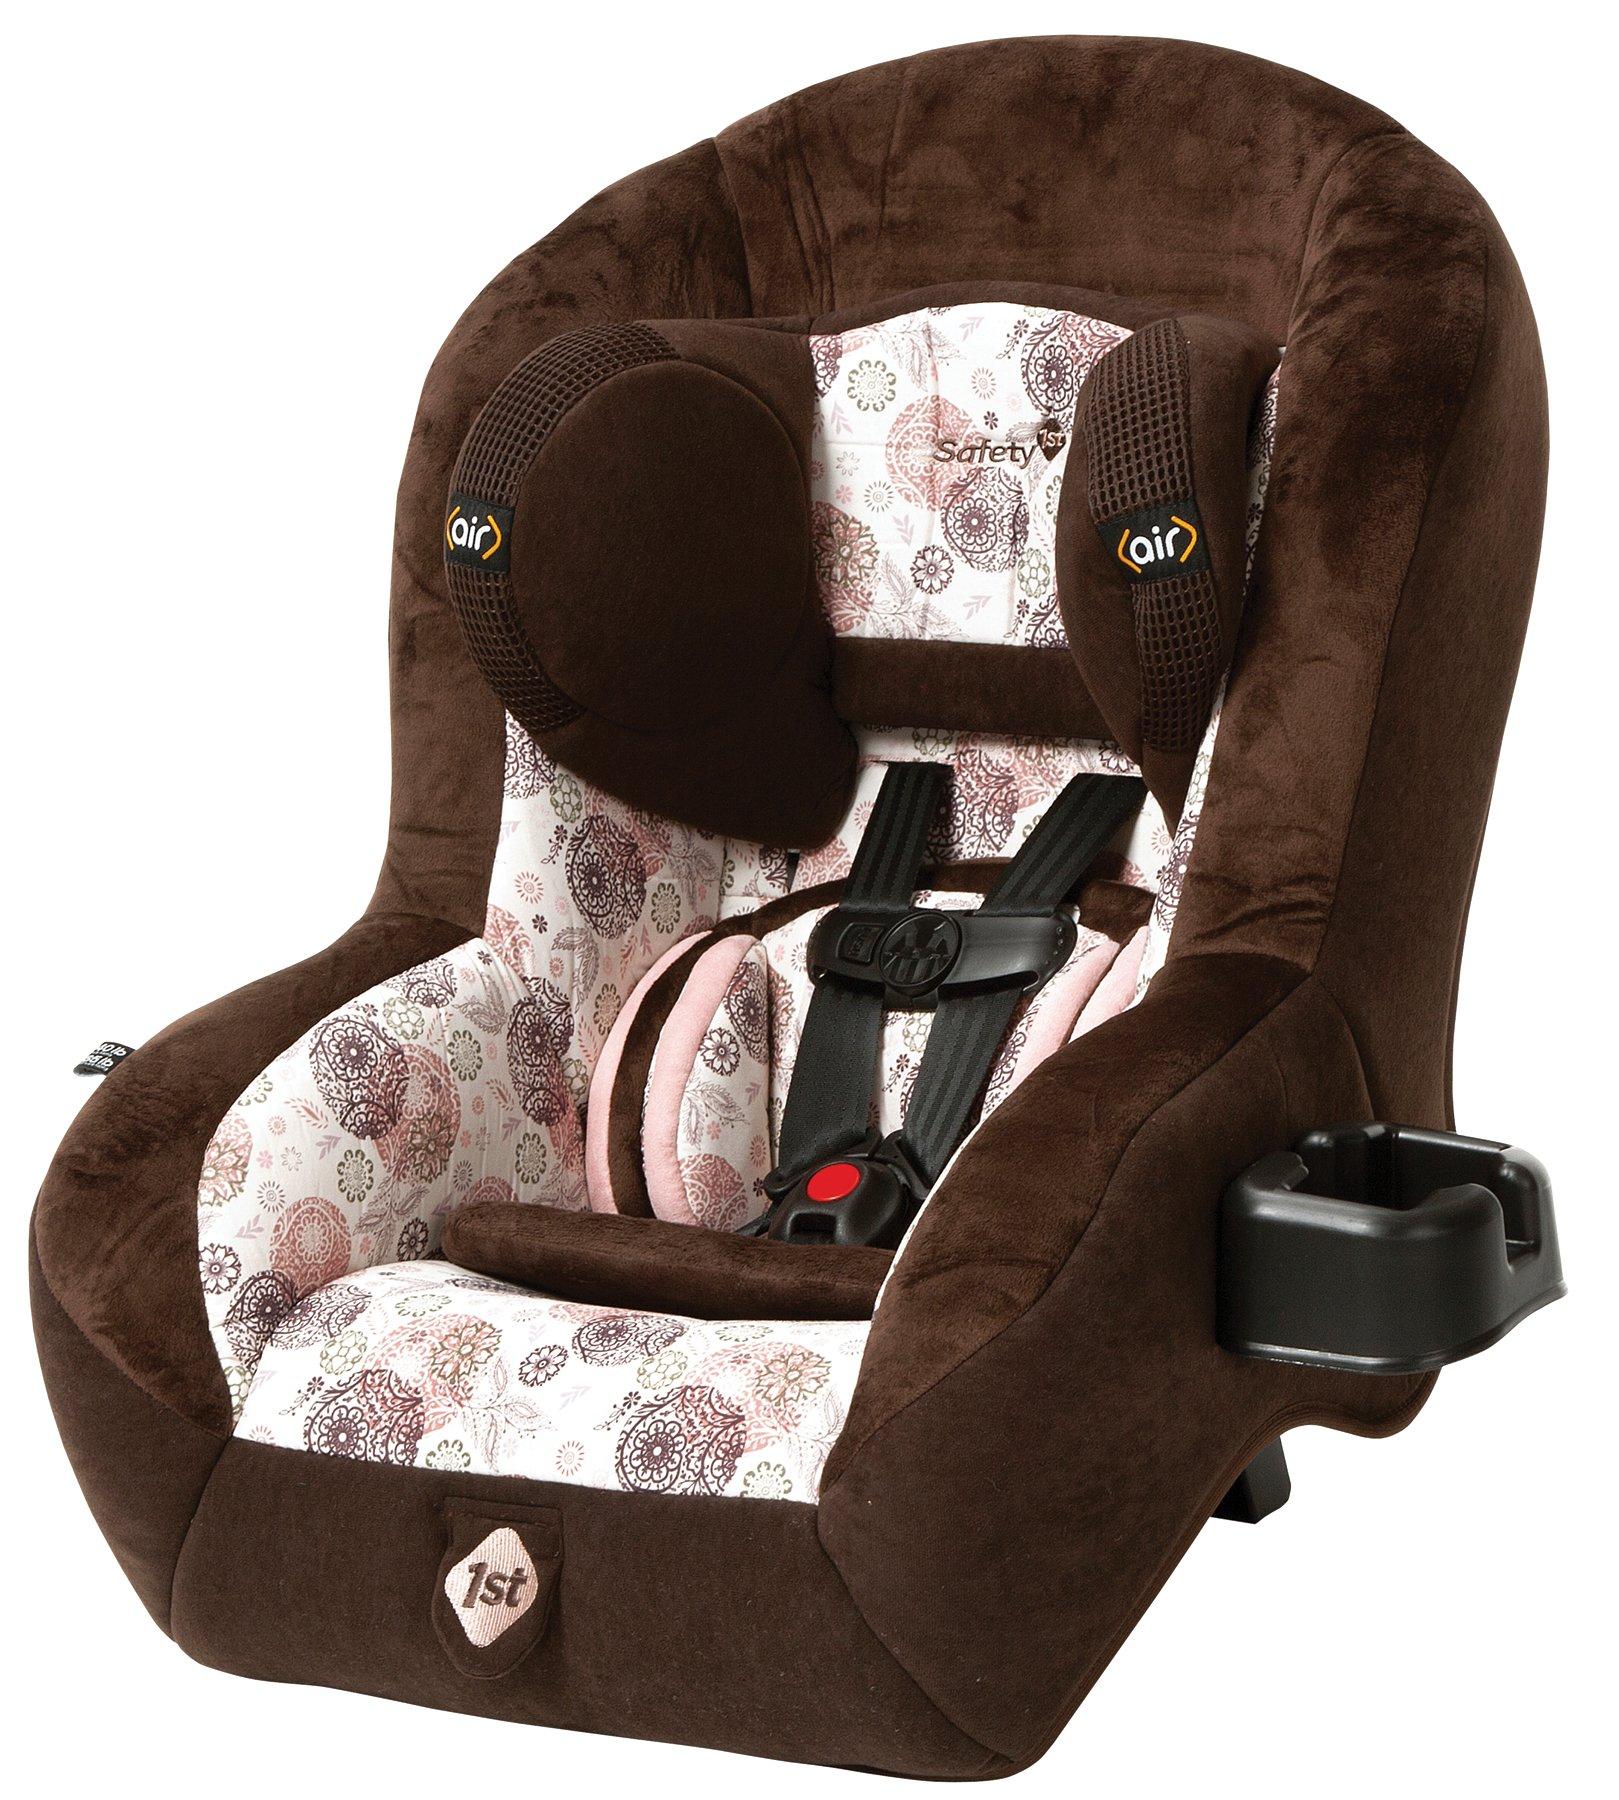 Safety 1st Chart 65 Air Convertible Car Seat, Yardley